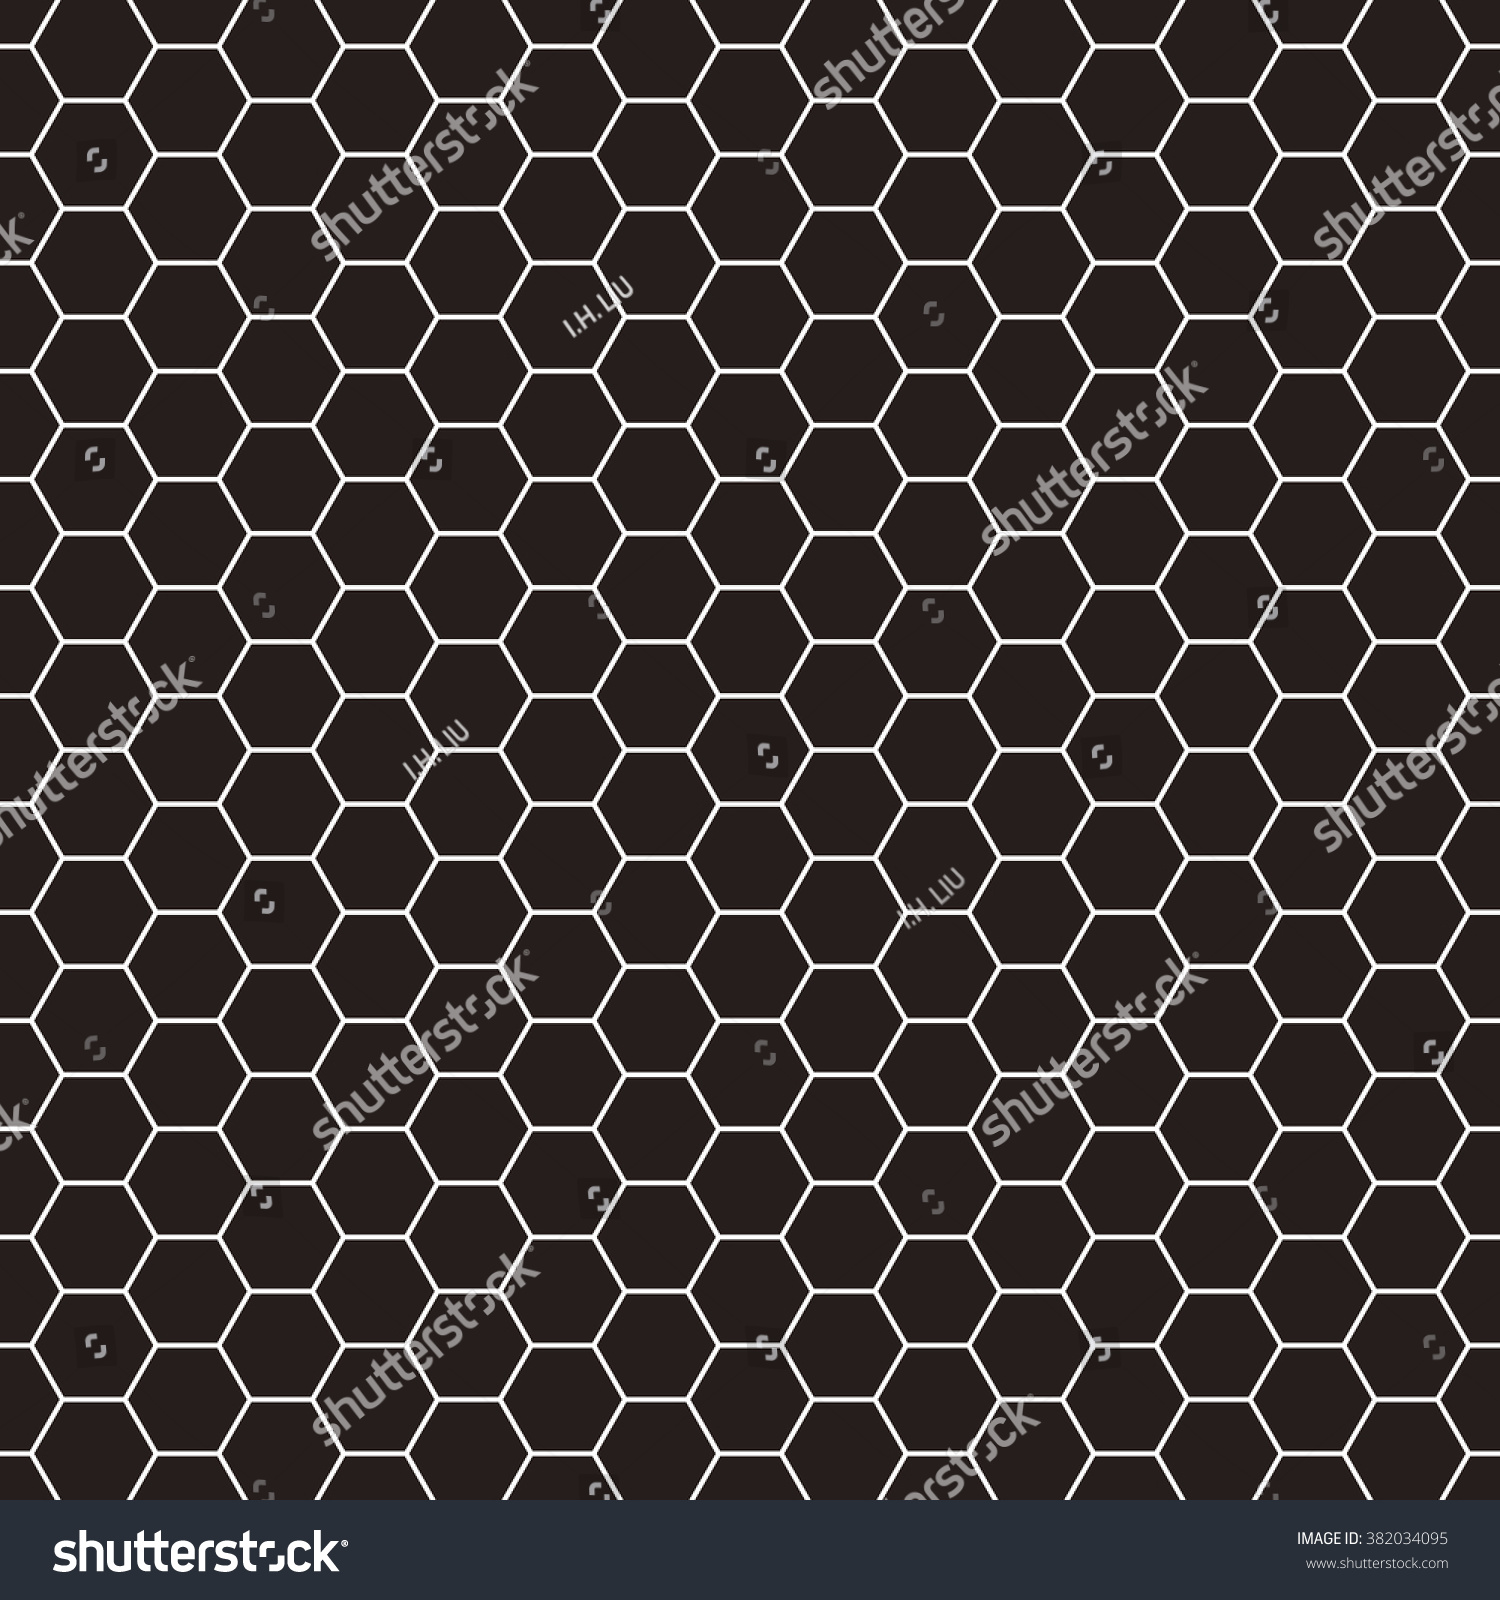 Hexagonal Grid Design Vector Seamless Pattern Stock Vector